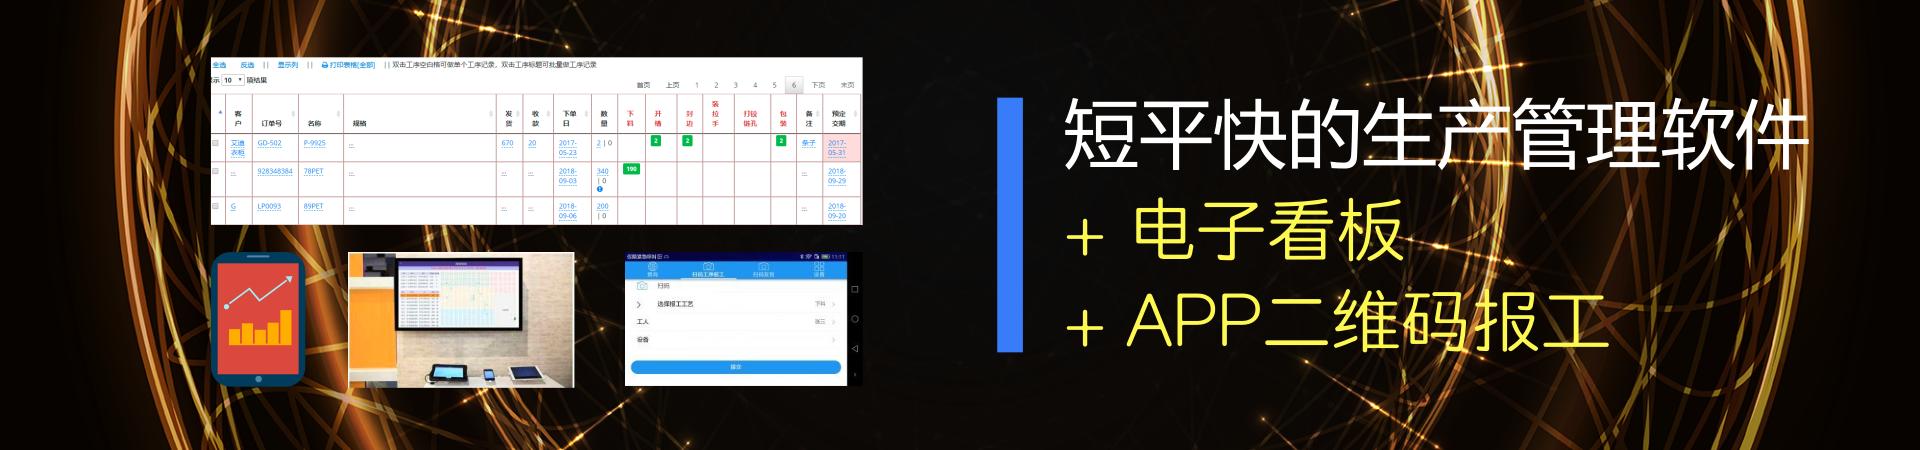 trybanner4 2018.09.16 - 苏州通商软件MES软件MoreExcel插件